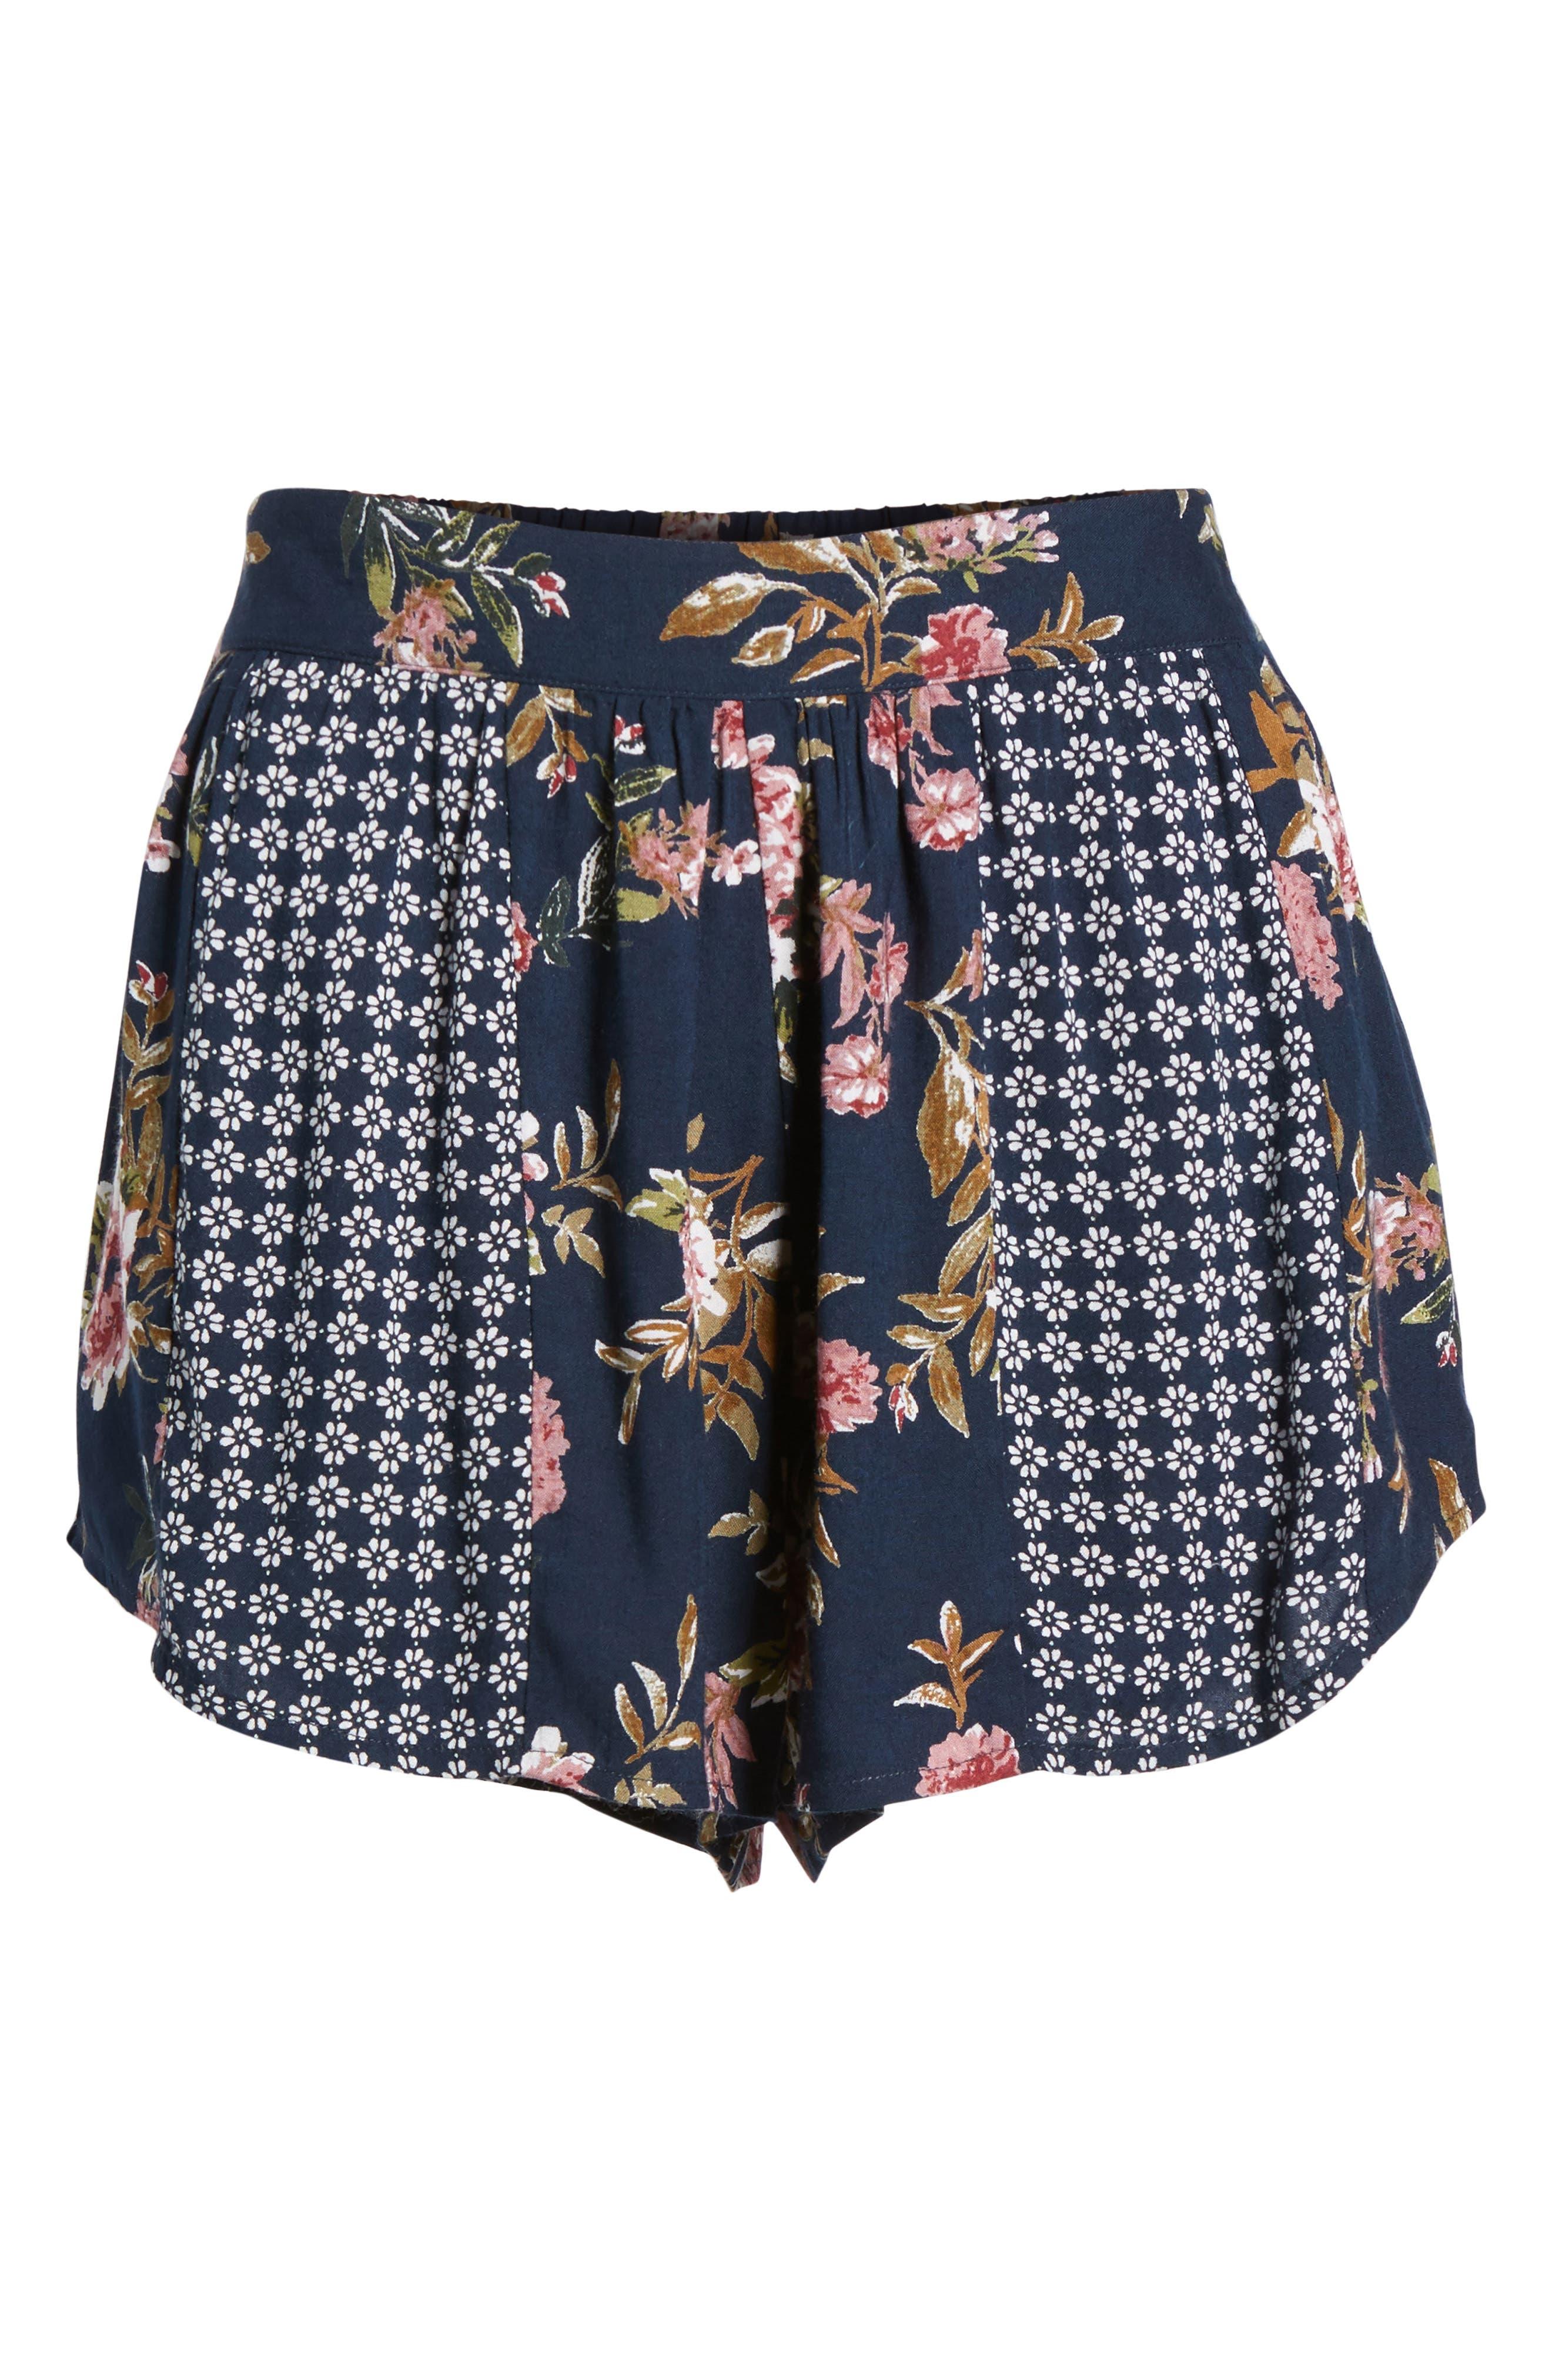 Mix Print Shorts,                             Alternate thumbnail 7, color,                             Navy/ Olive